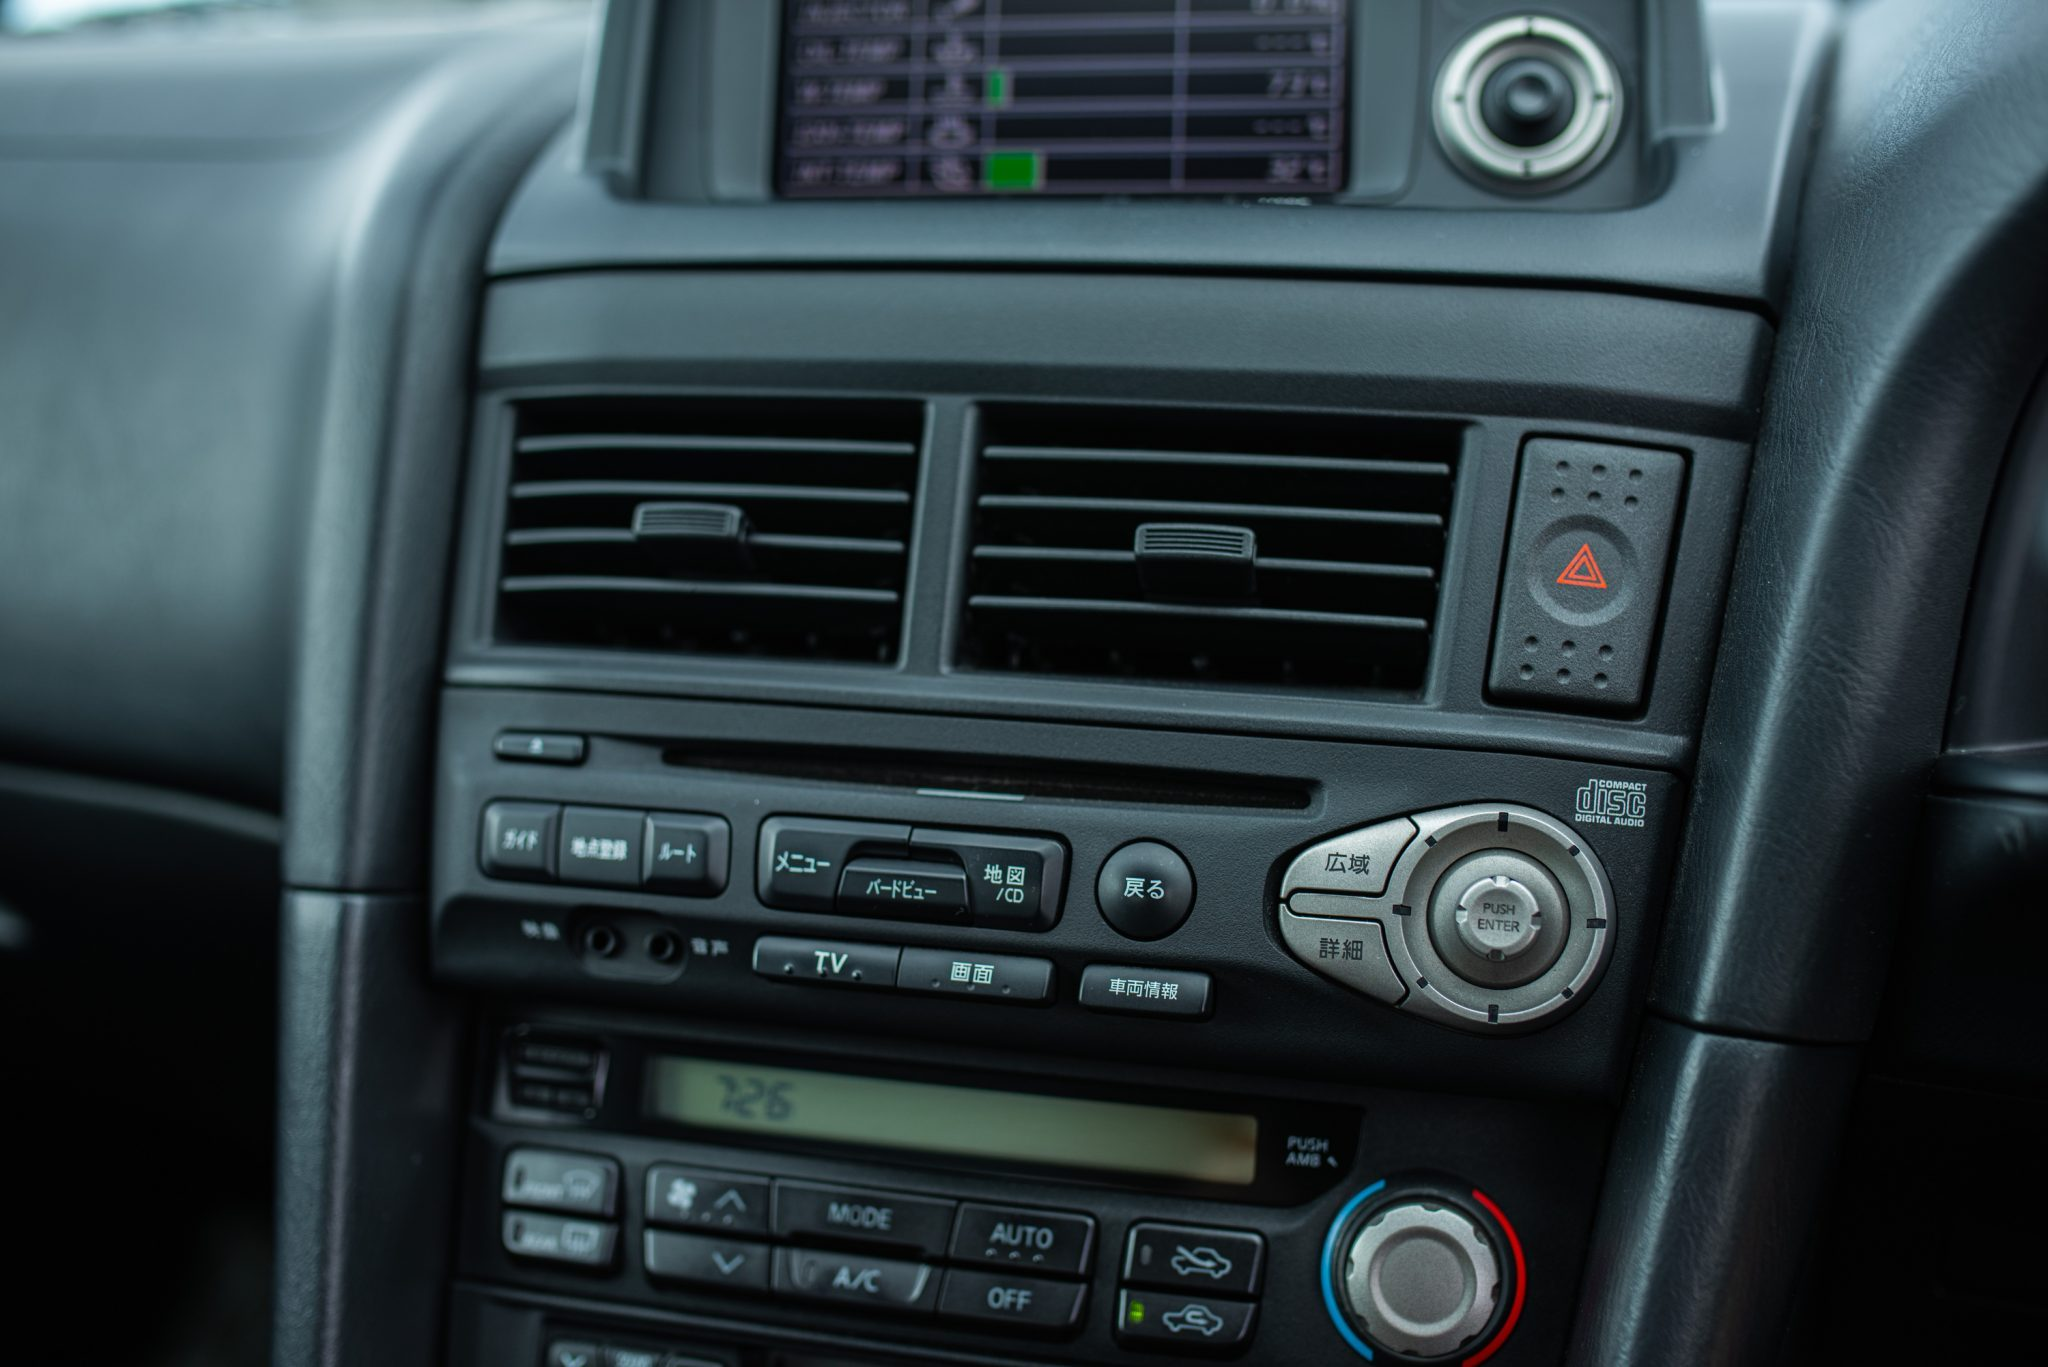 1999 Nissan Skyline GT-R V-Spec climate control